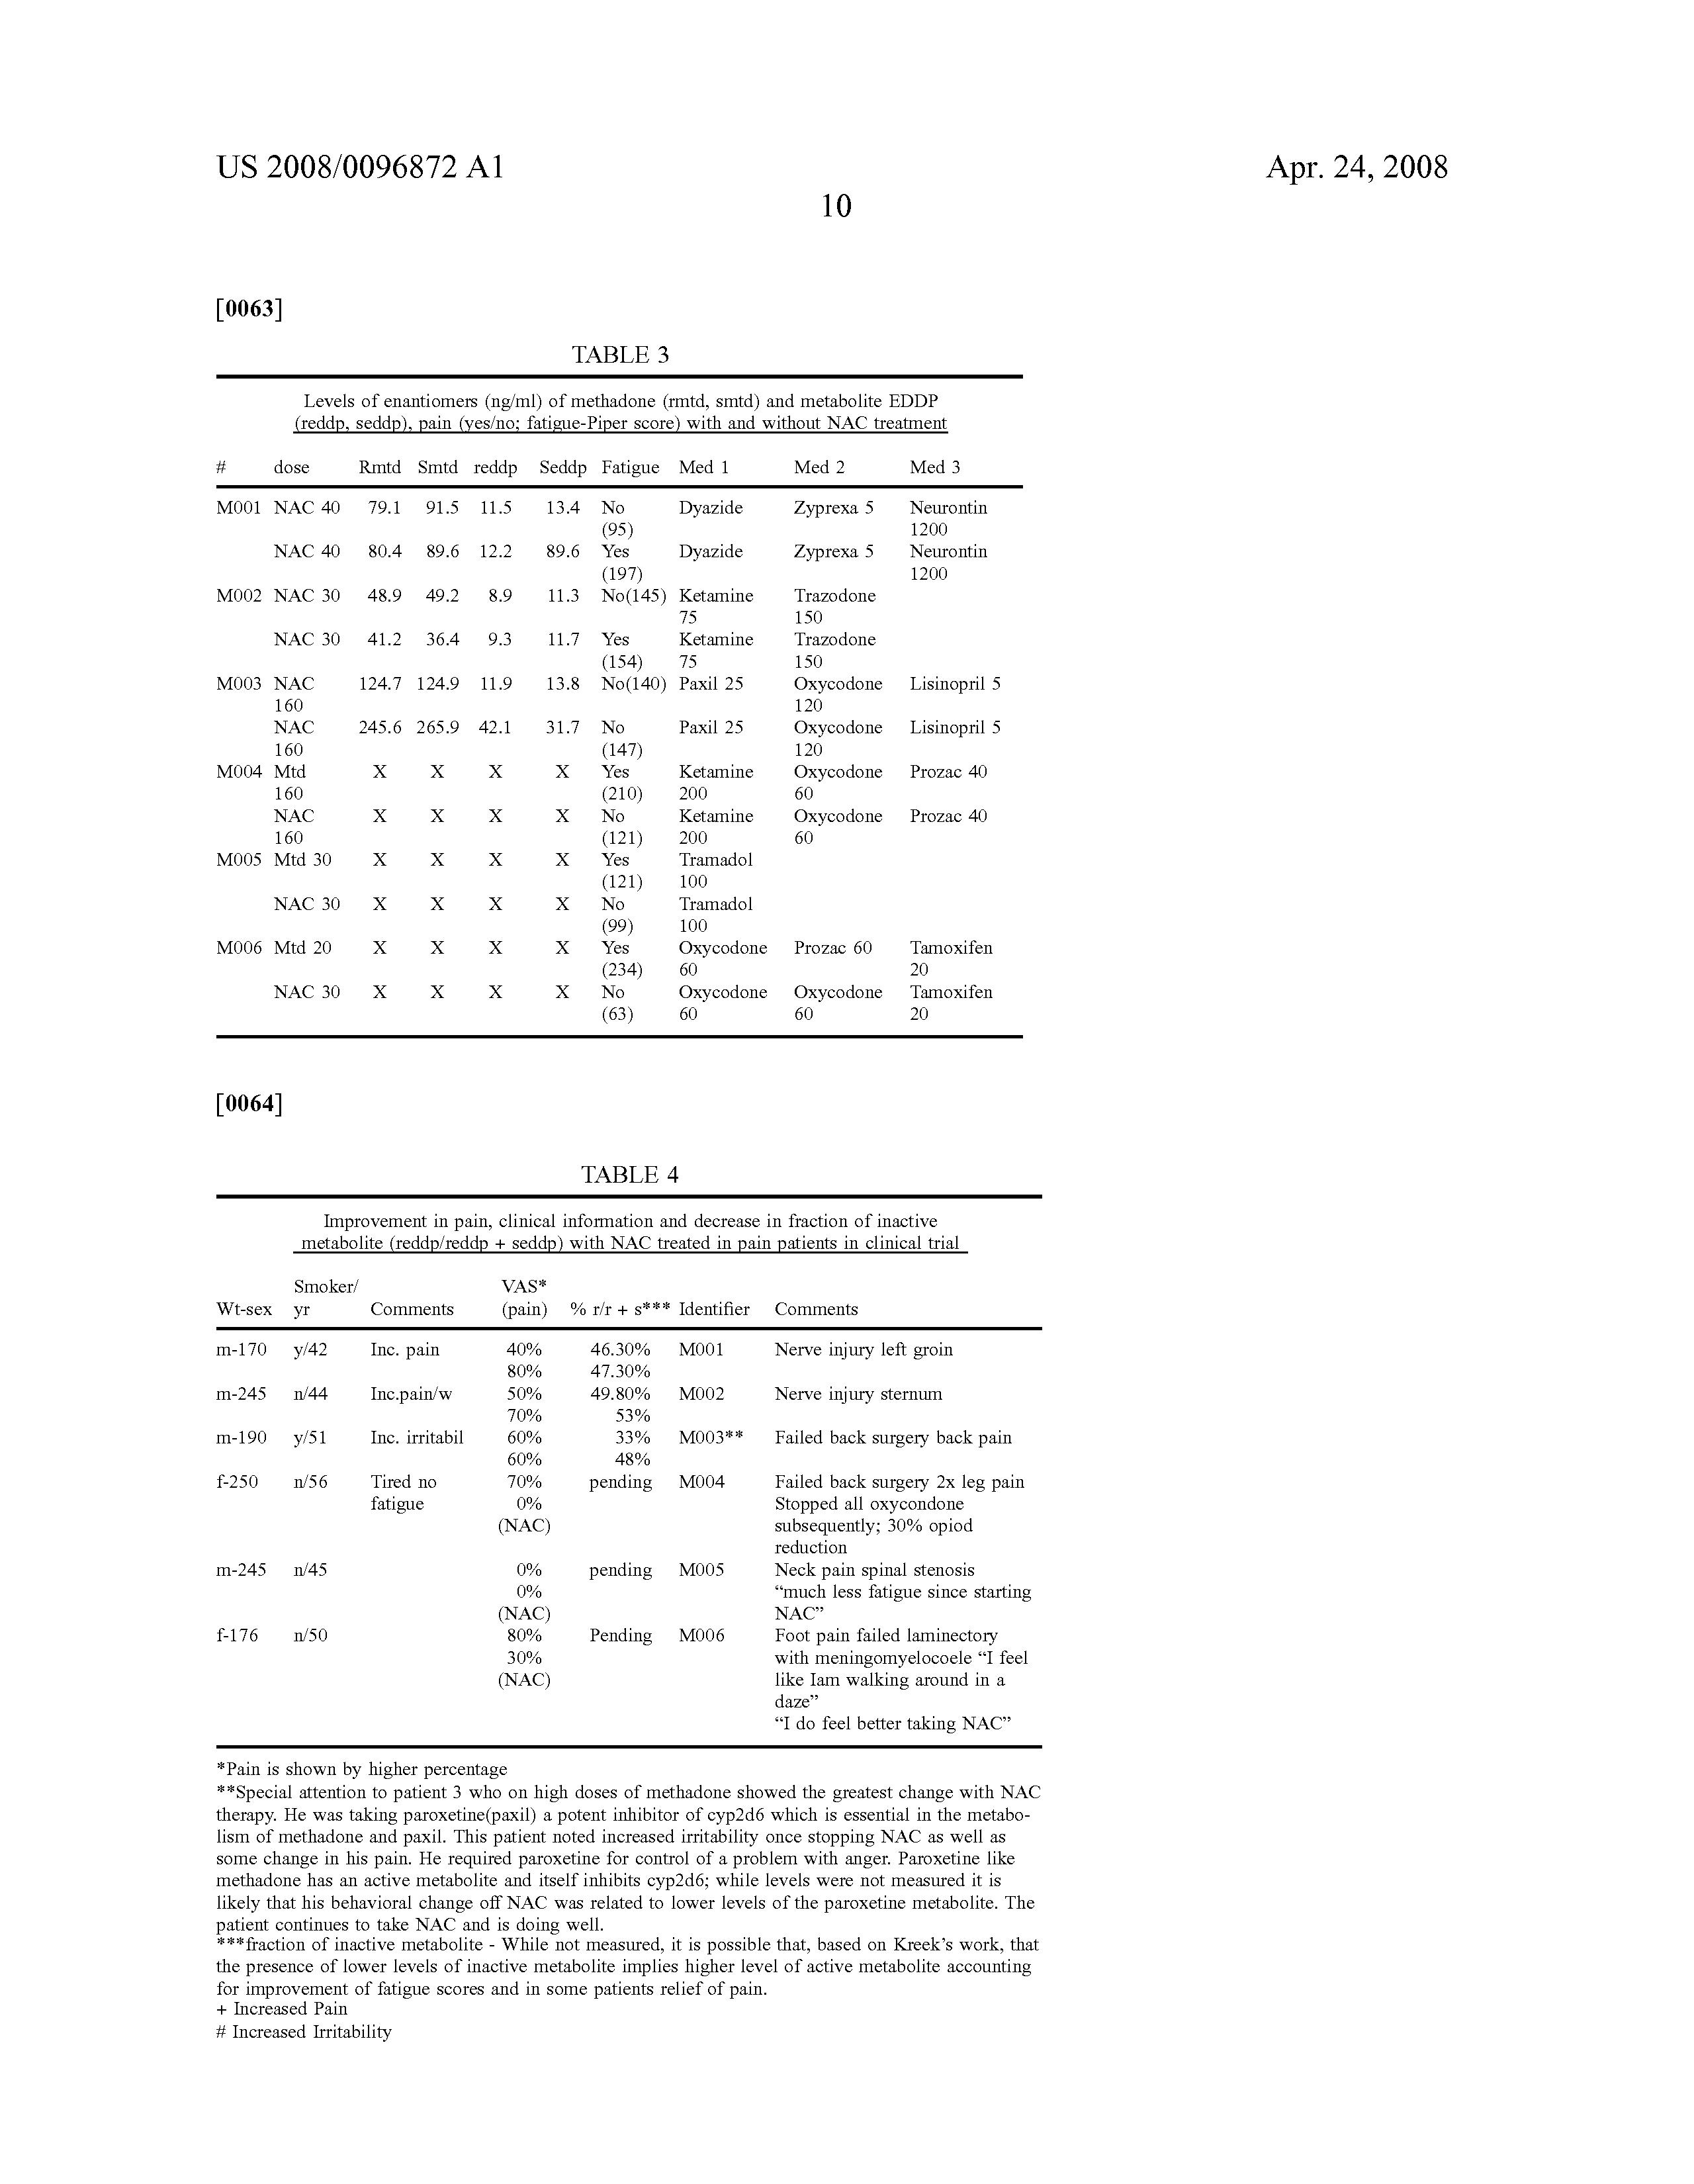 Cipro m002 form